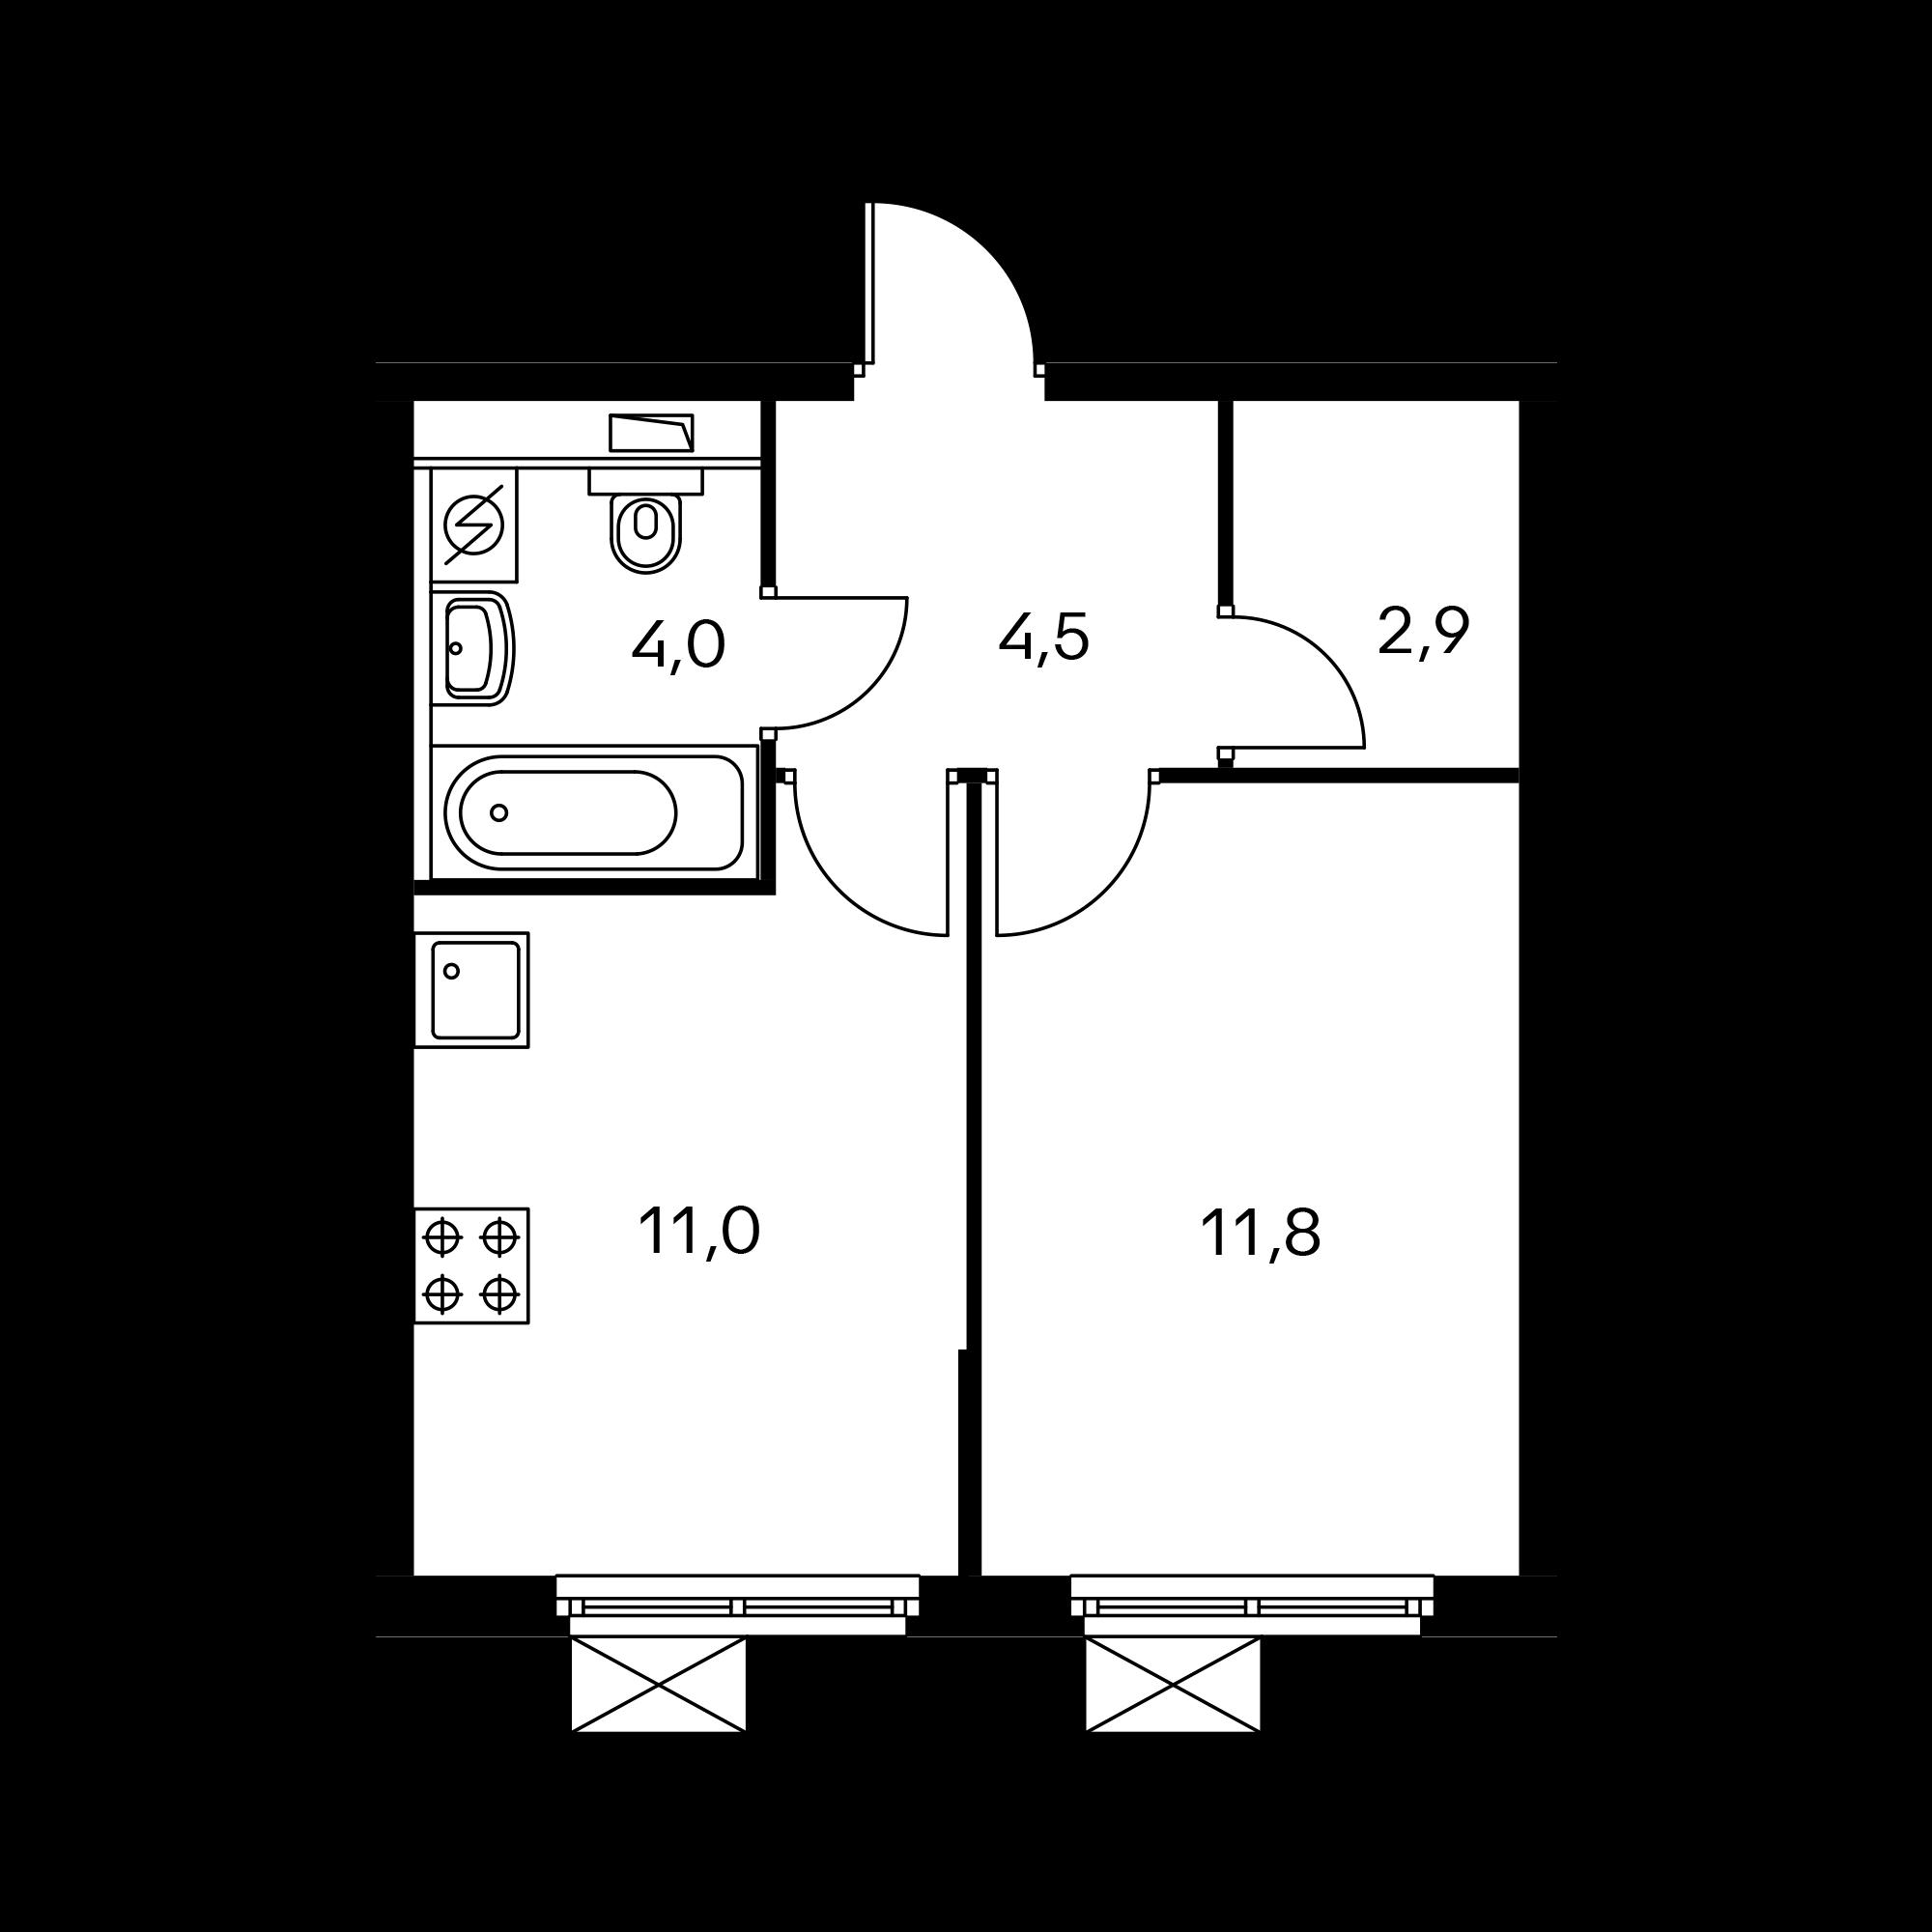 1KS1_6.0-1_A